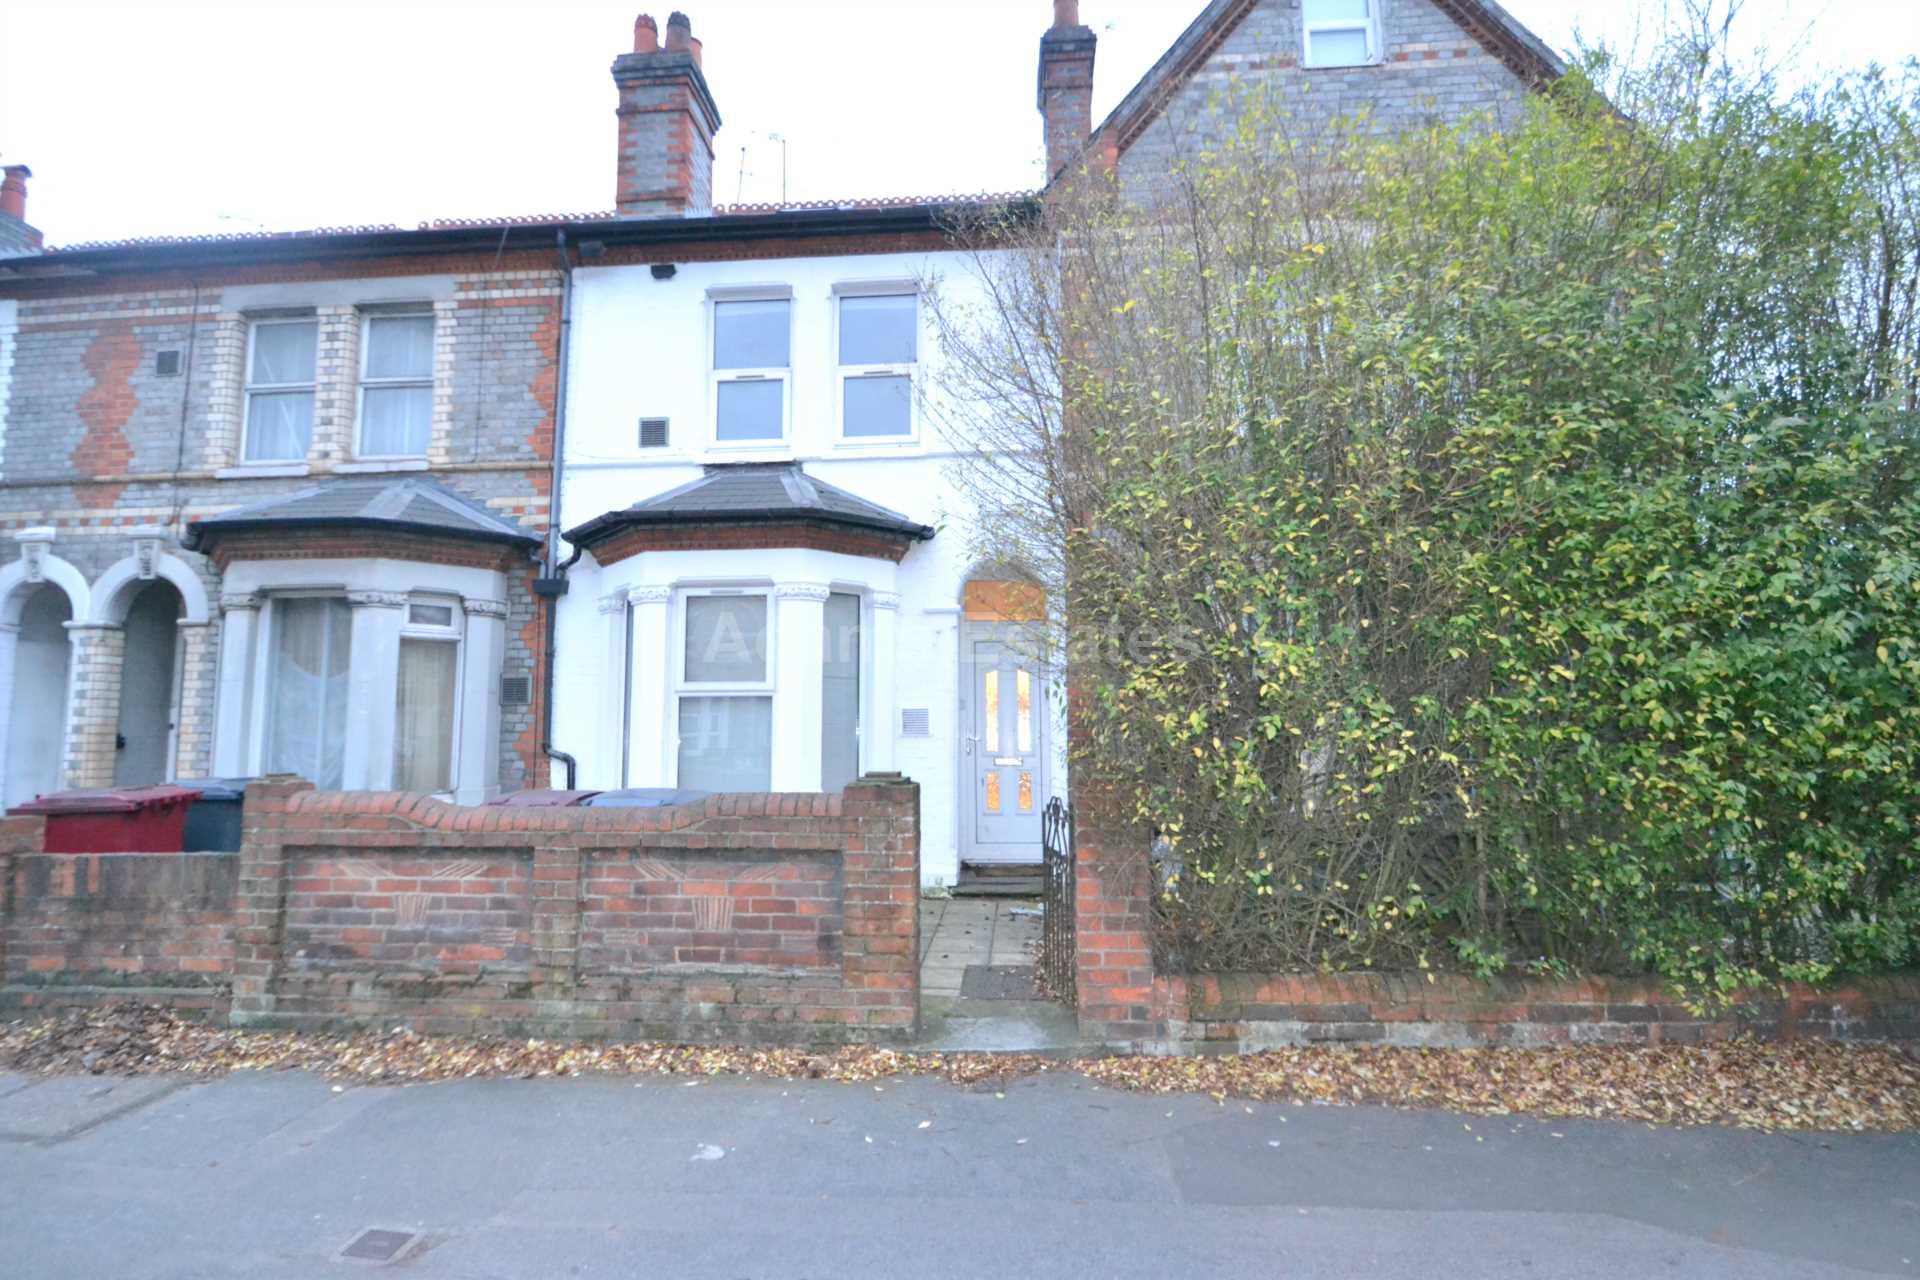 London Road, Reading, Image 1